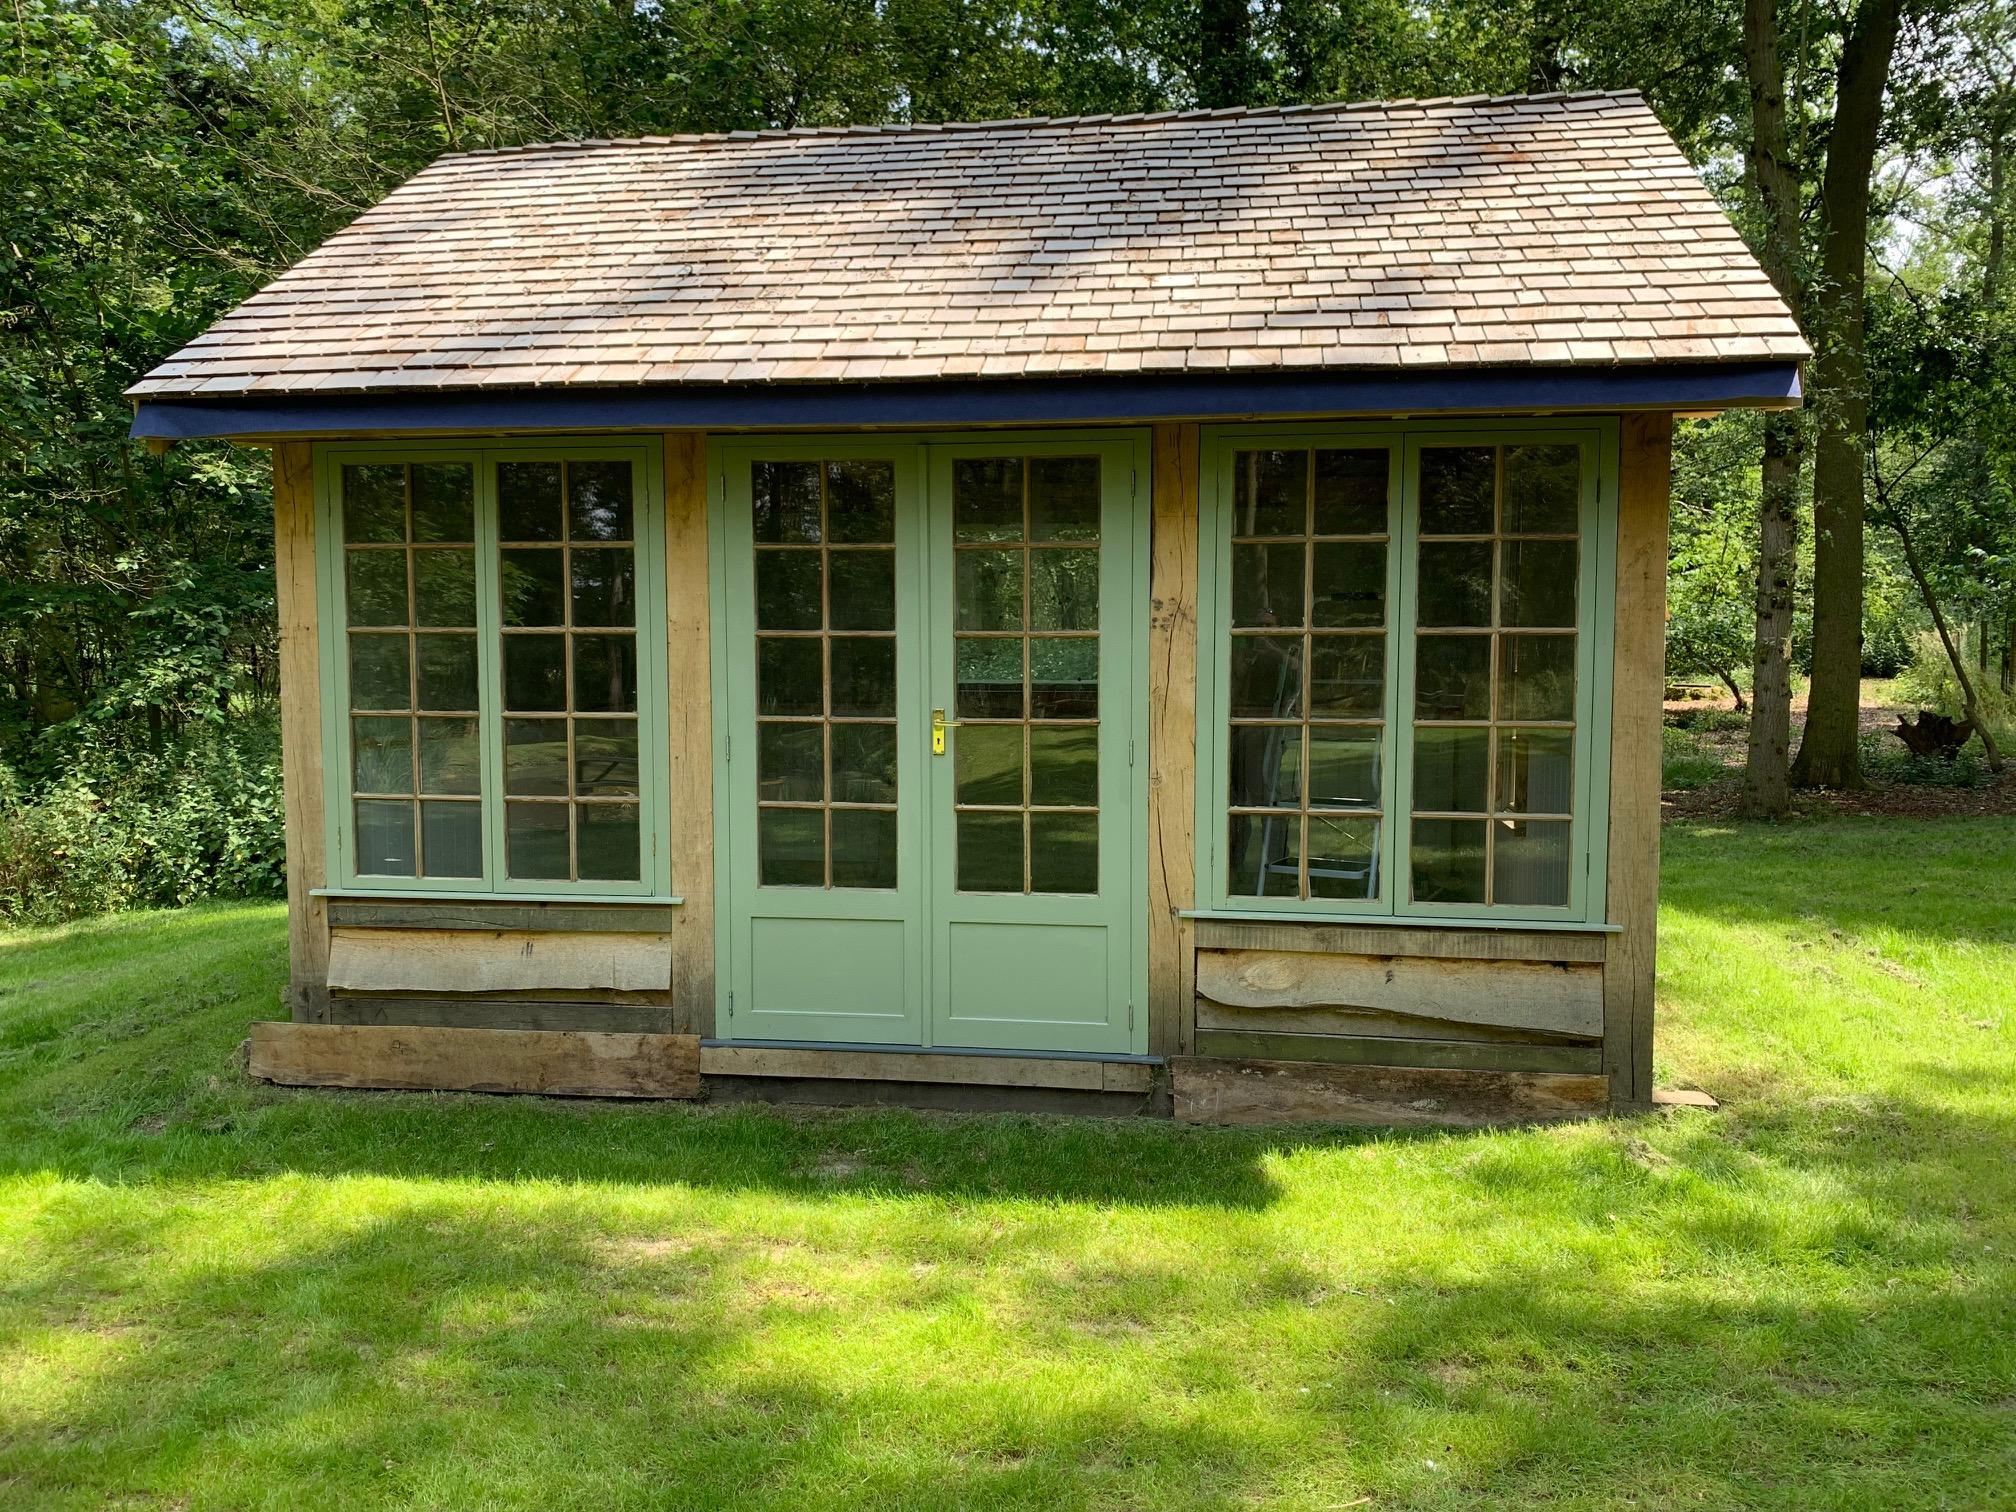 A magical oak framed cabin in the woods